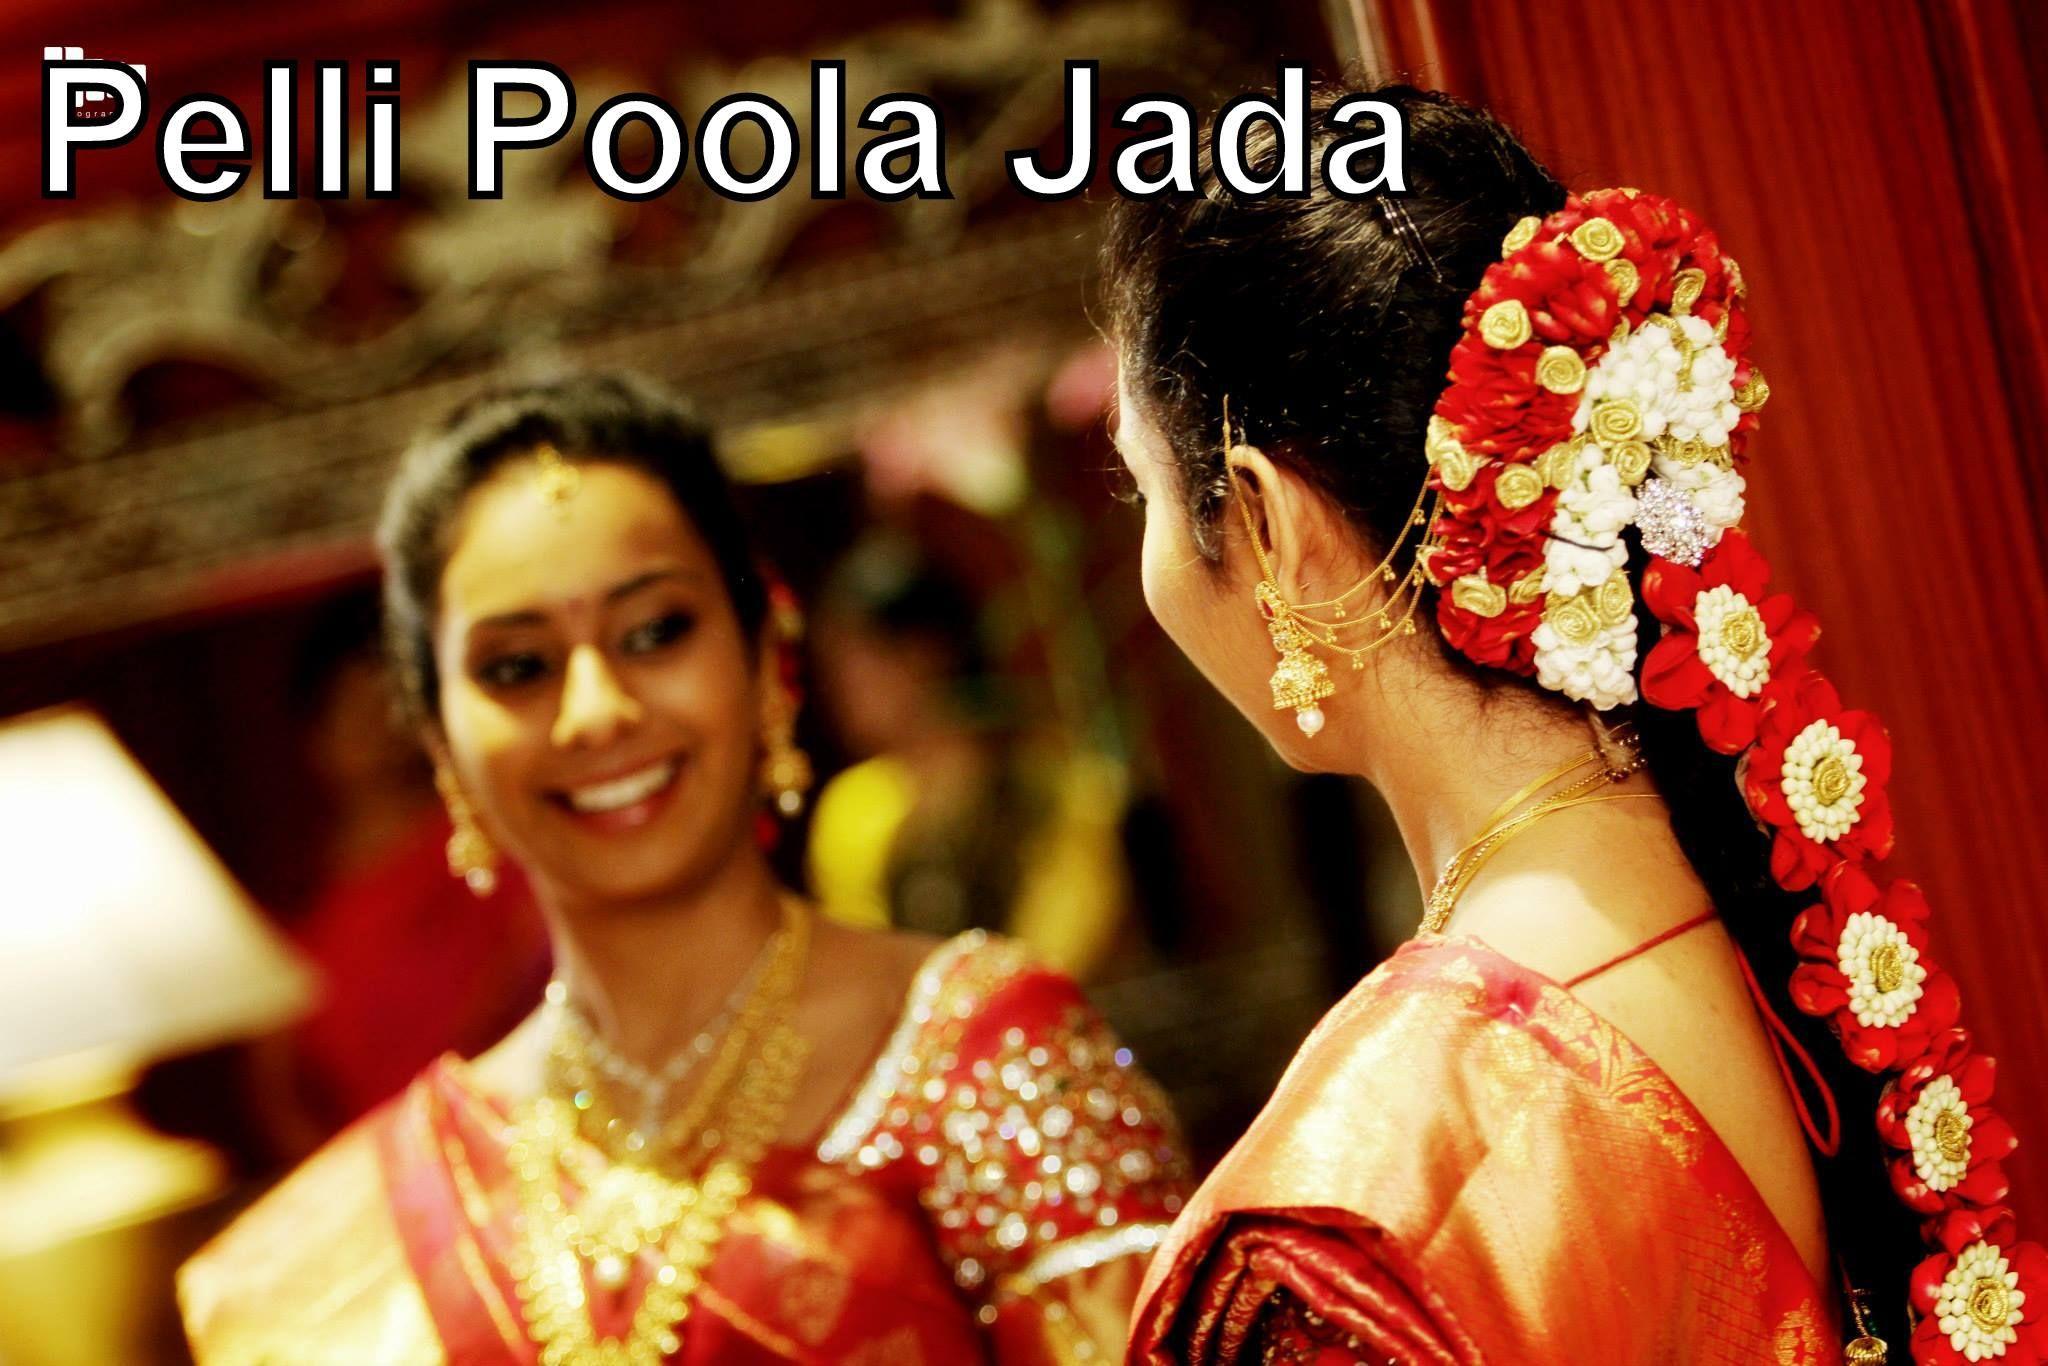 pelli poola jada, bridal hair style made in hyderabad, india